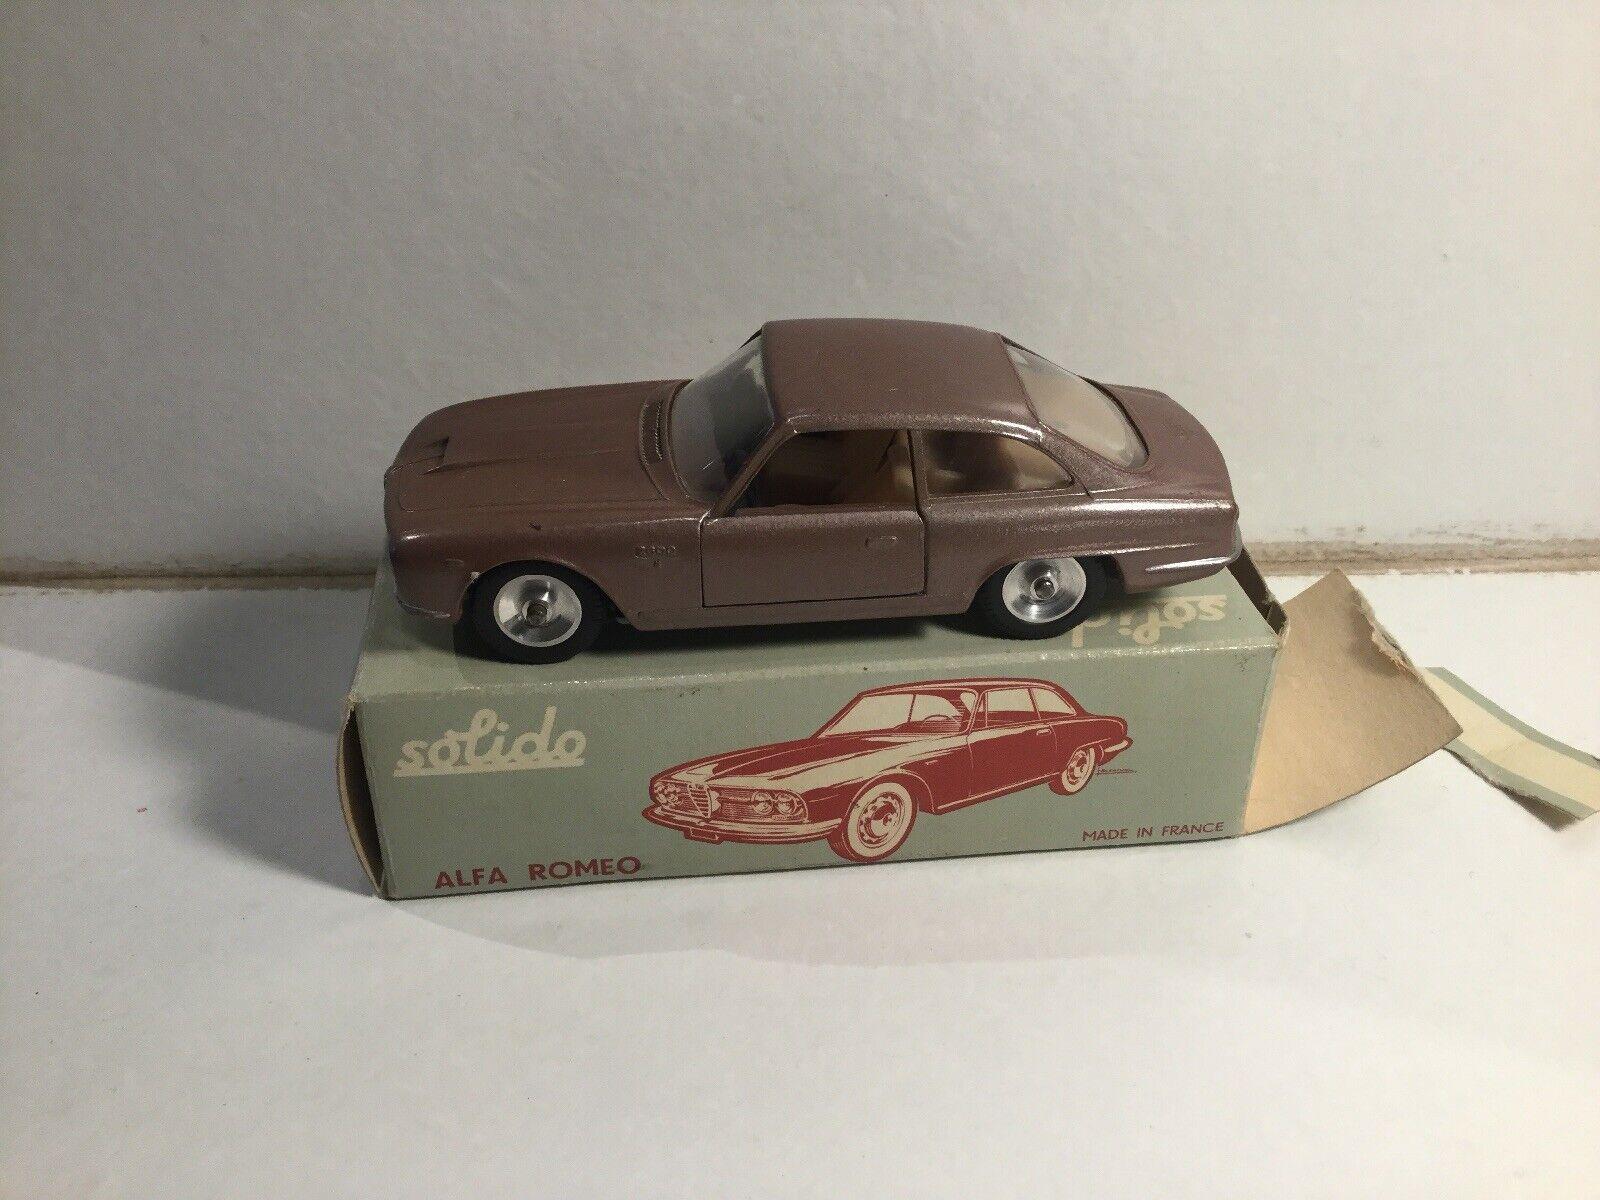 Solido Diecast No 125 Alfa Romeo 2600 Bertone 1 1 1 43 Within Its Original Box d5ba70